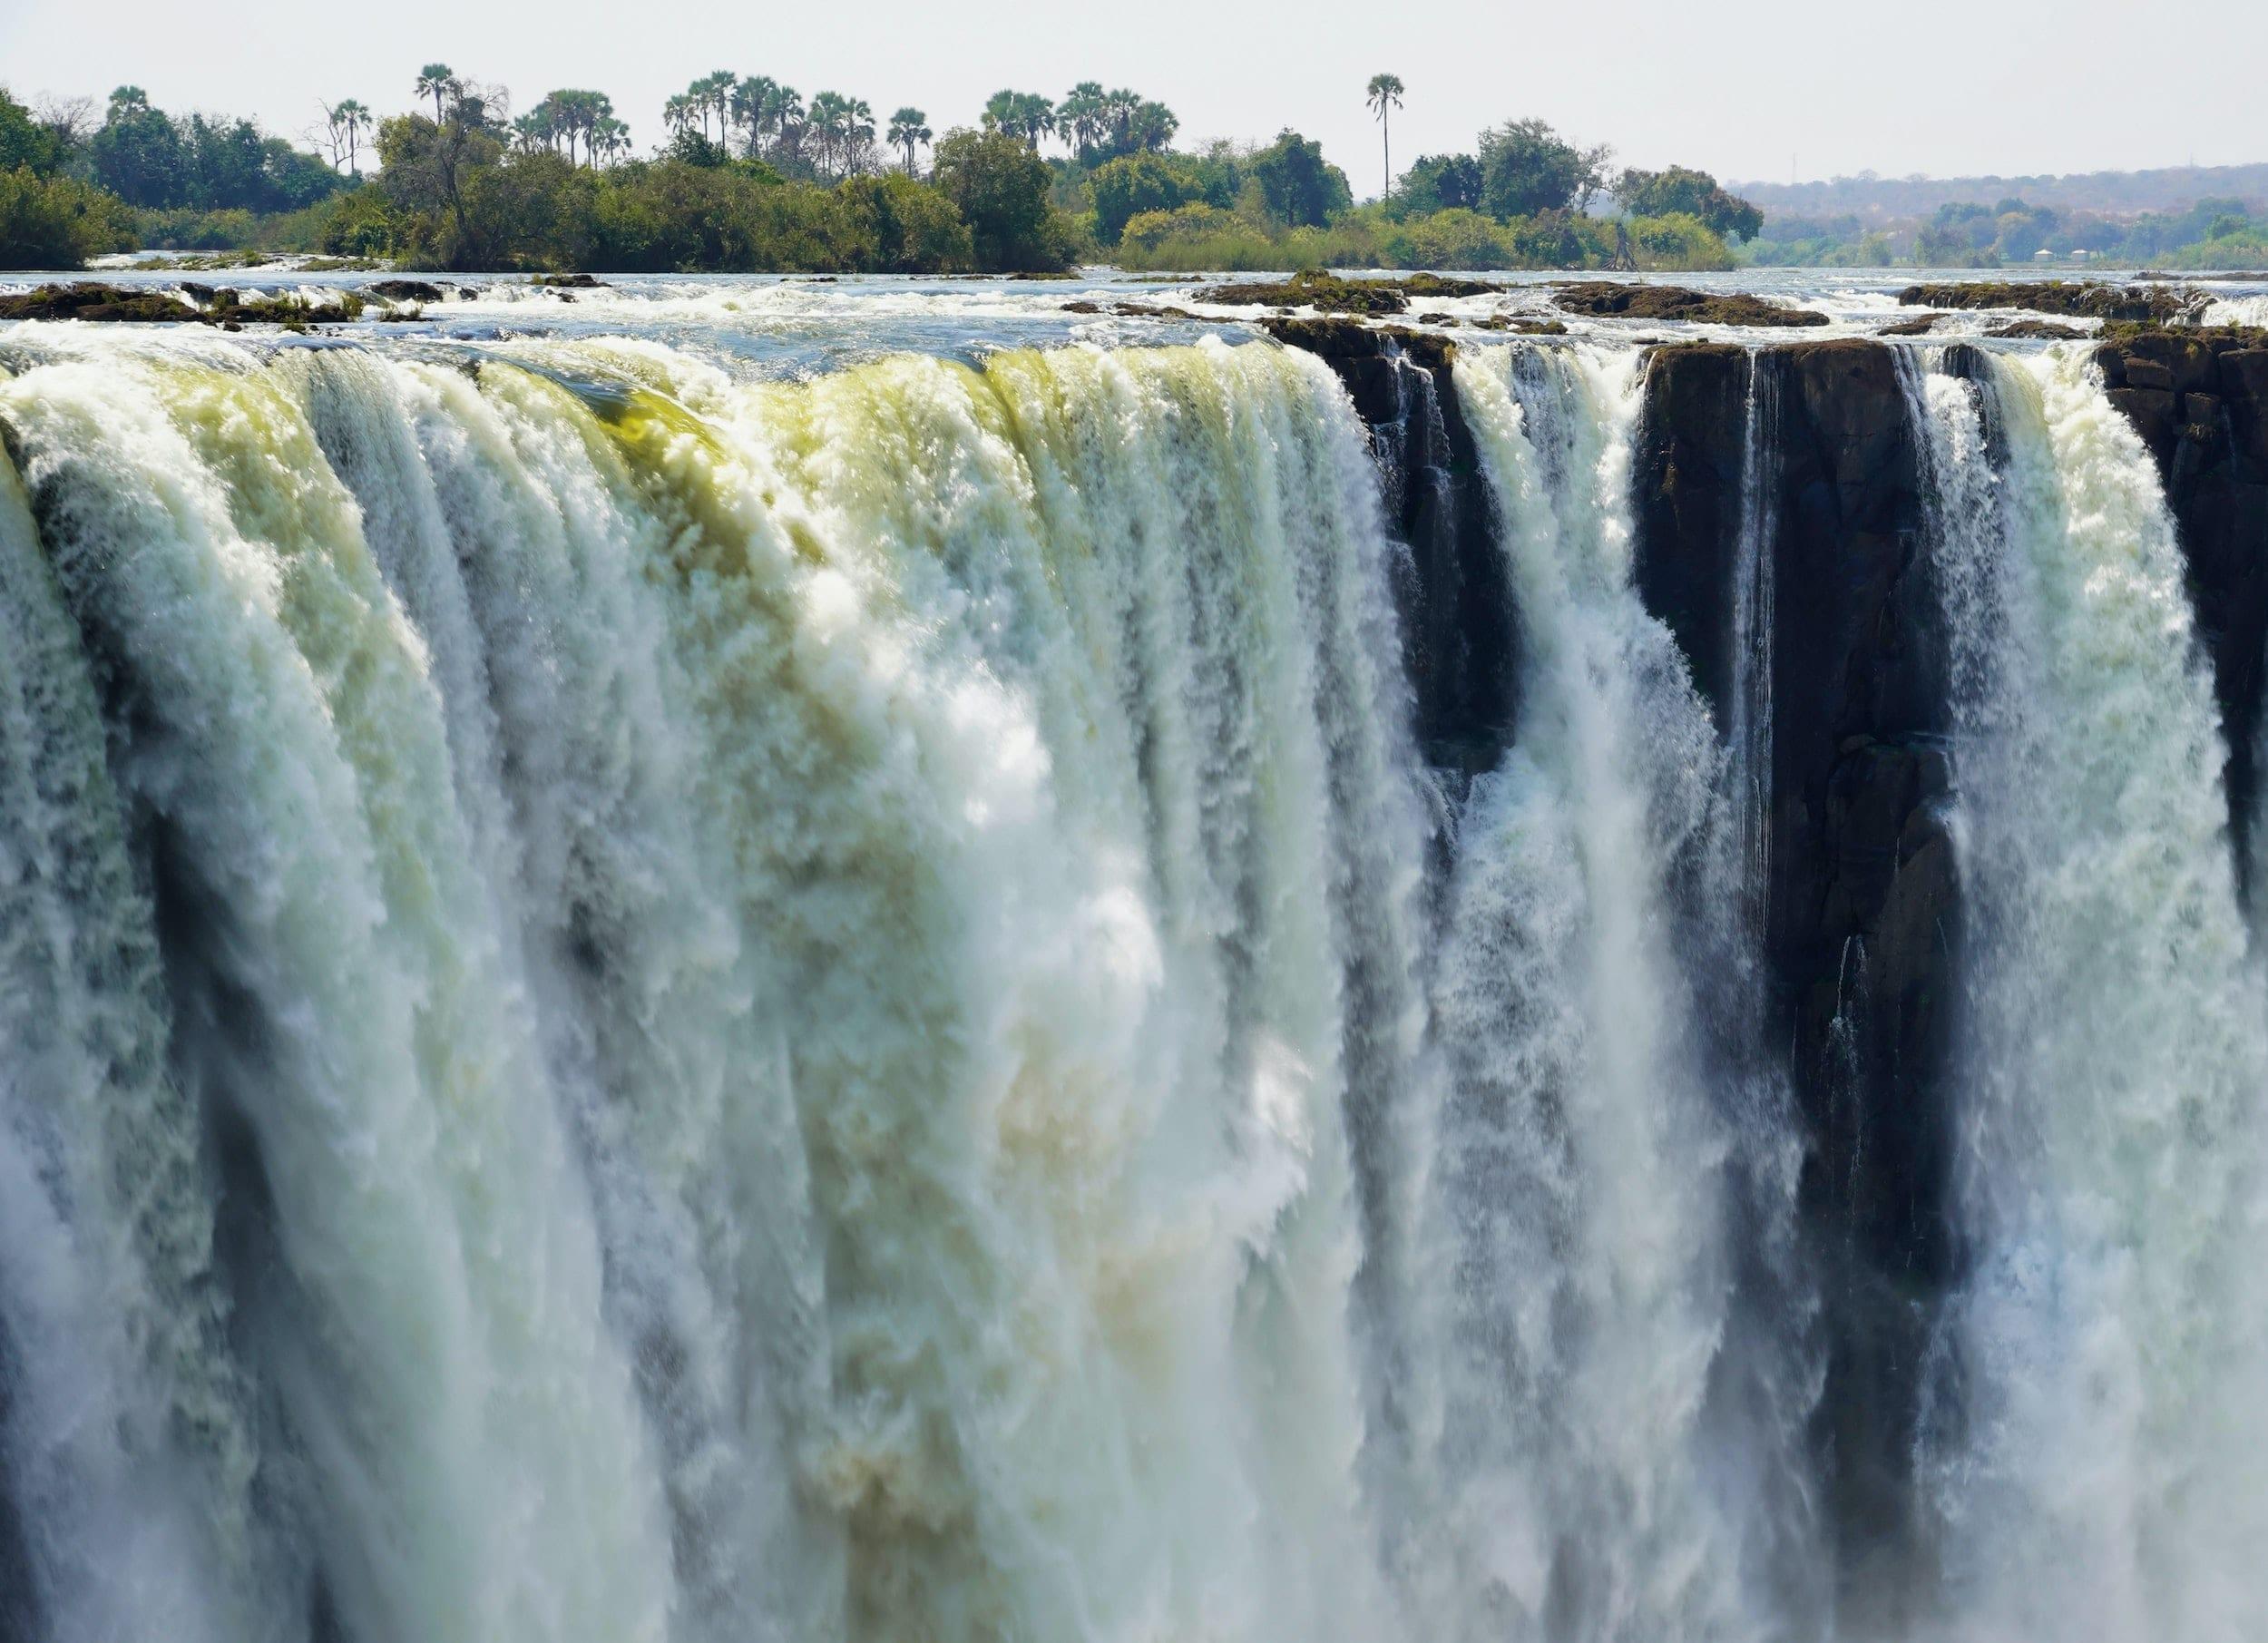 Dramatic image of Victoria Falls, Zambia, Africa